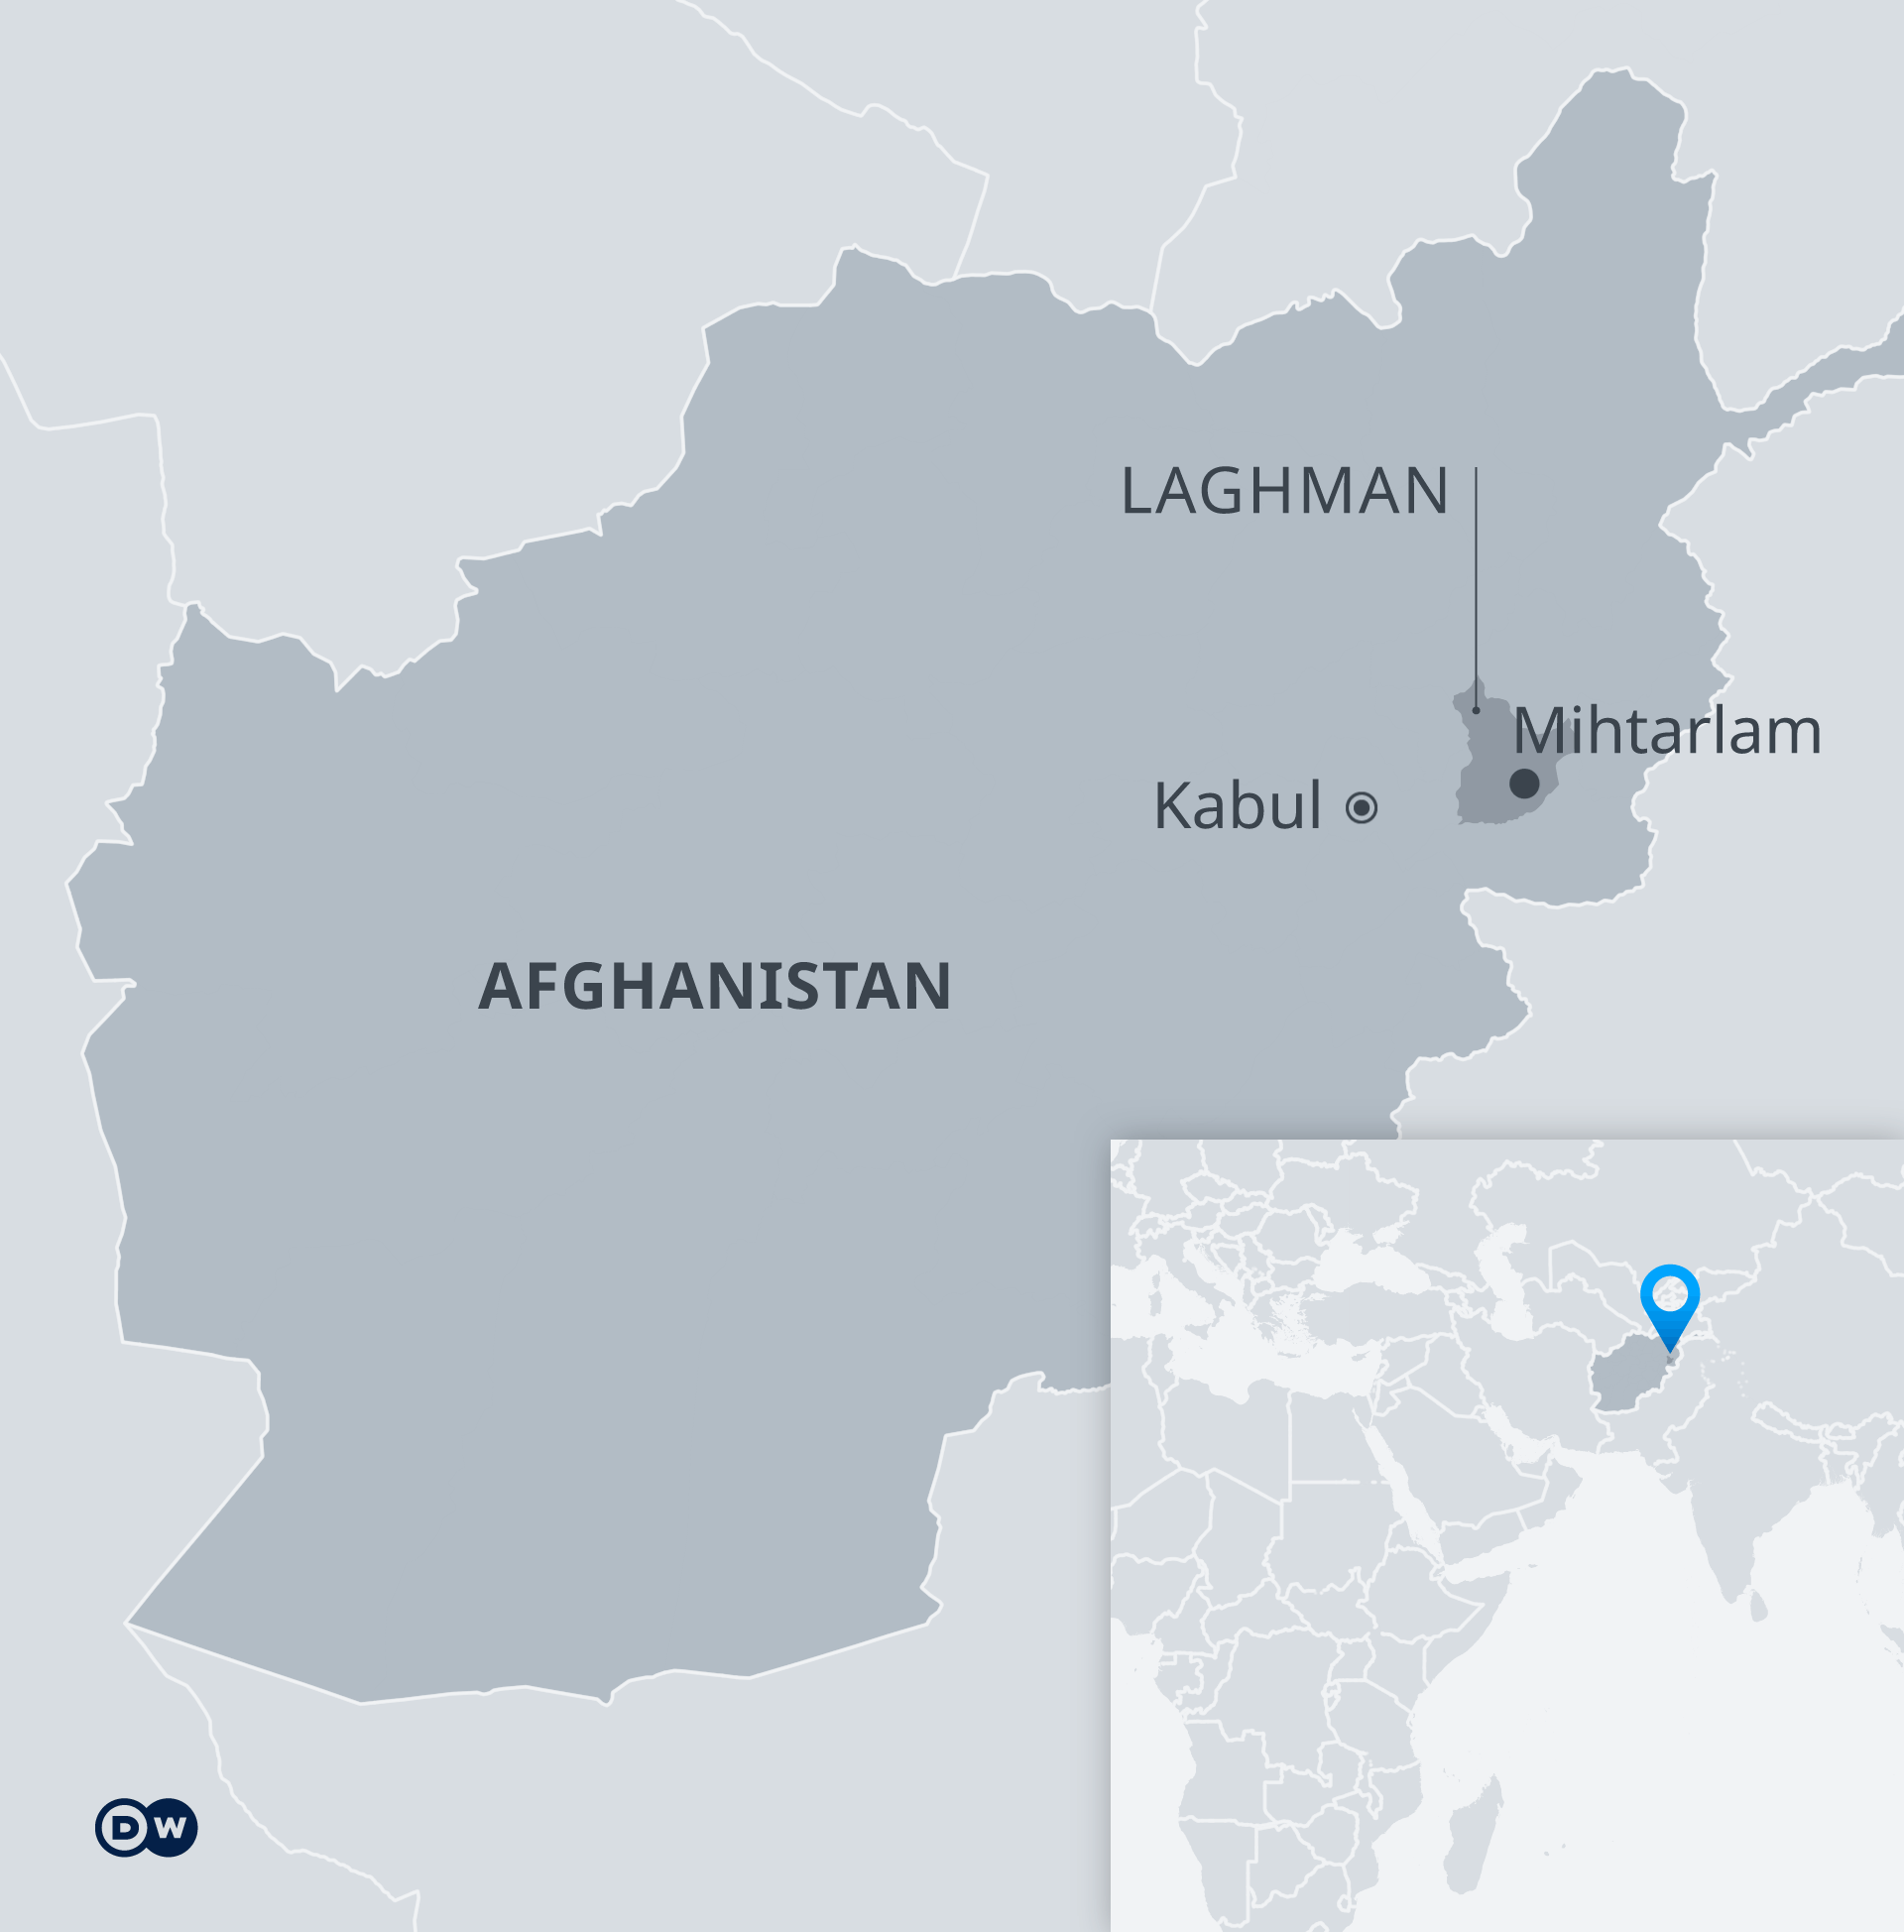 Karte Afghanistan Laghman Mihtarlam